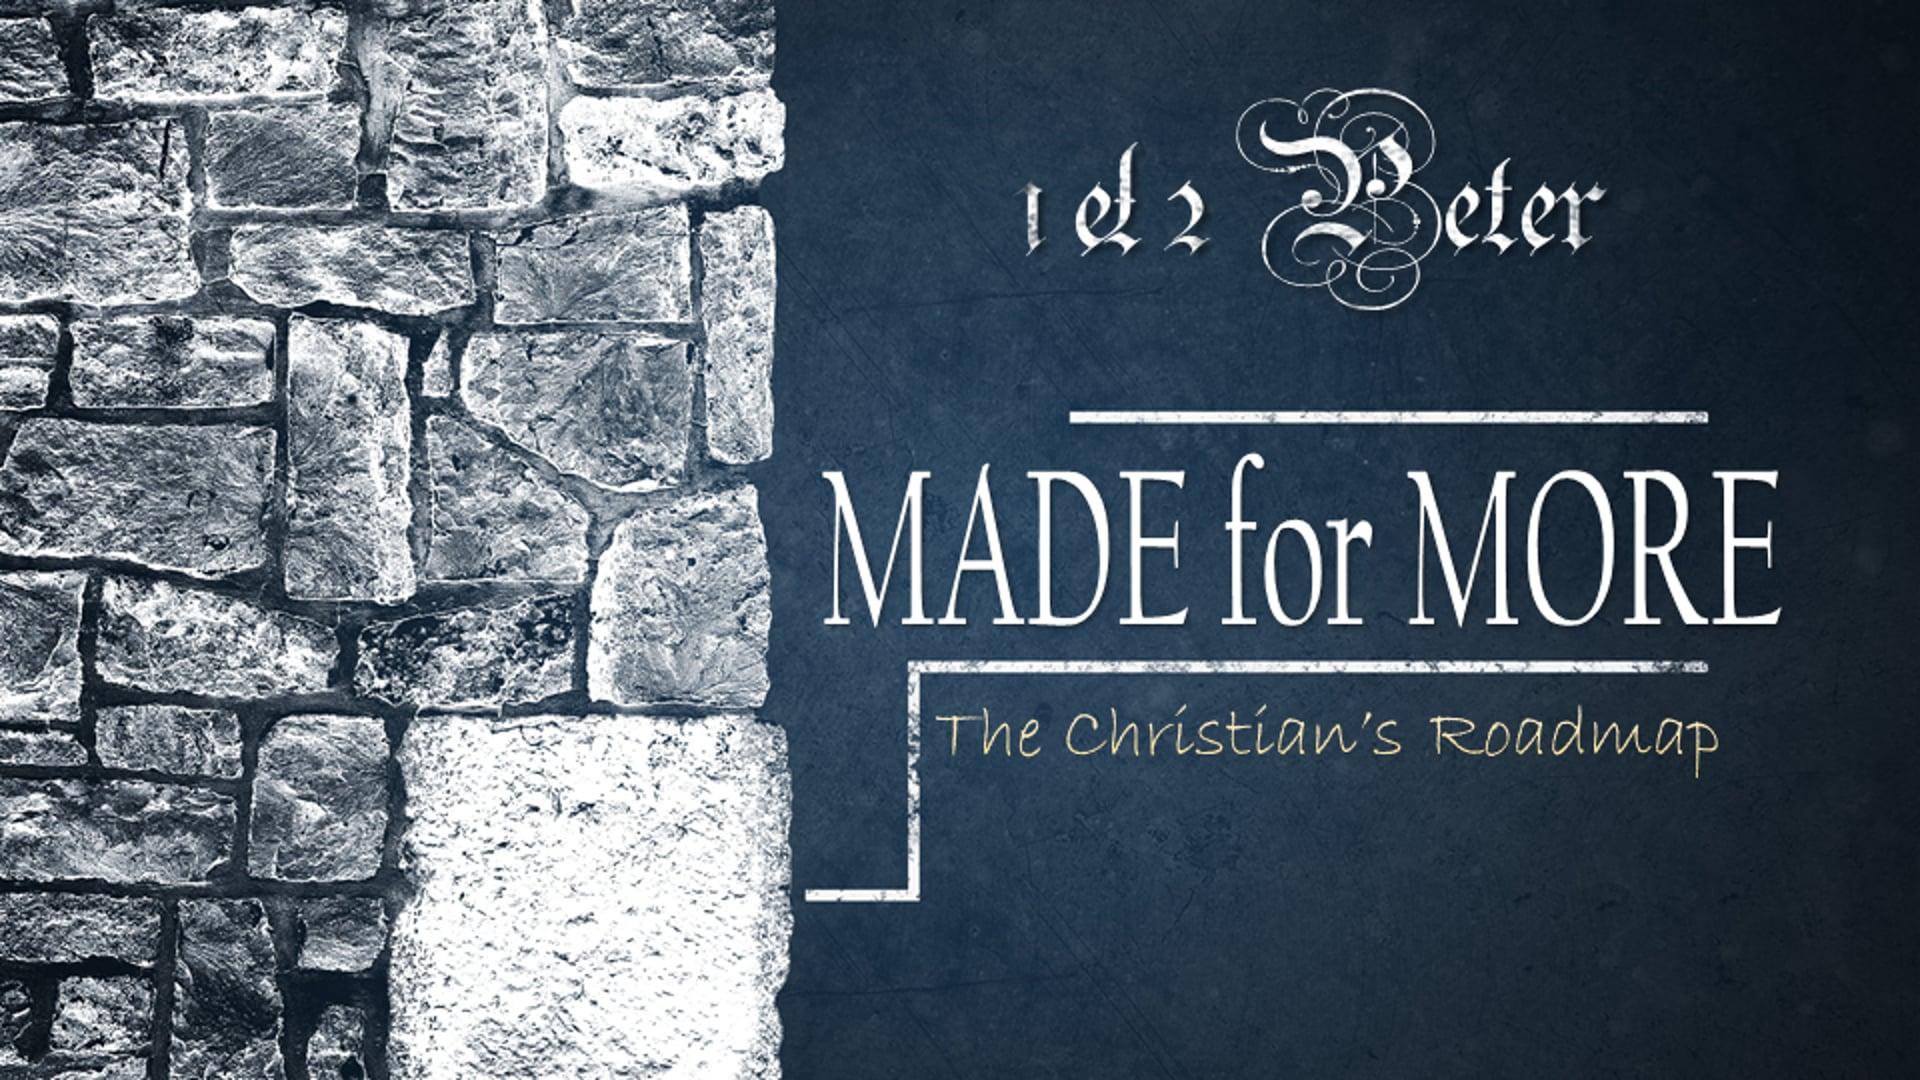 CCC Online Worship - August 30, 2020